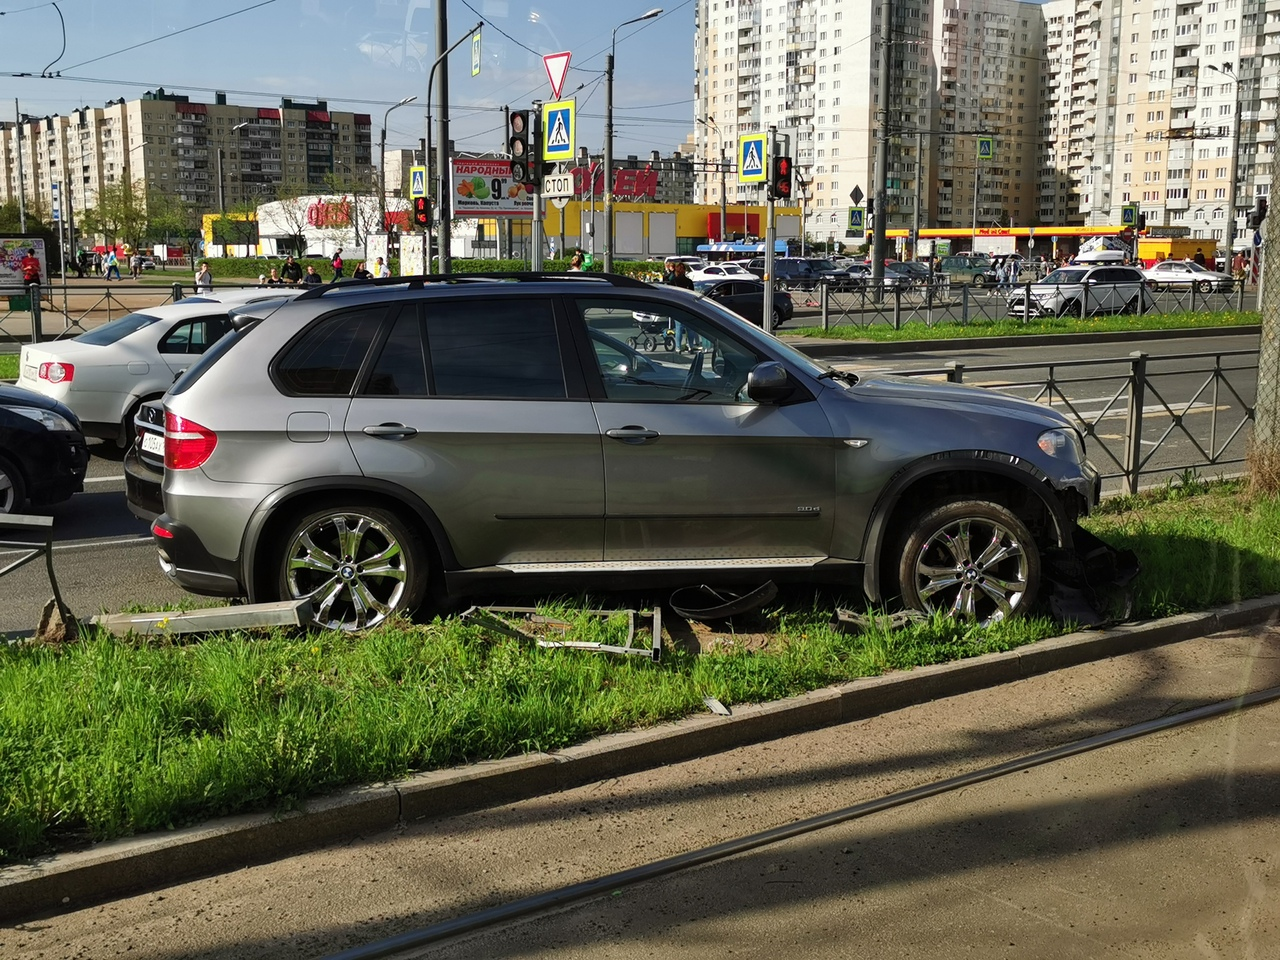 X5 снёс забор на проспекте Косыгина. Проезду особо не мешает)